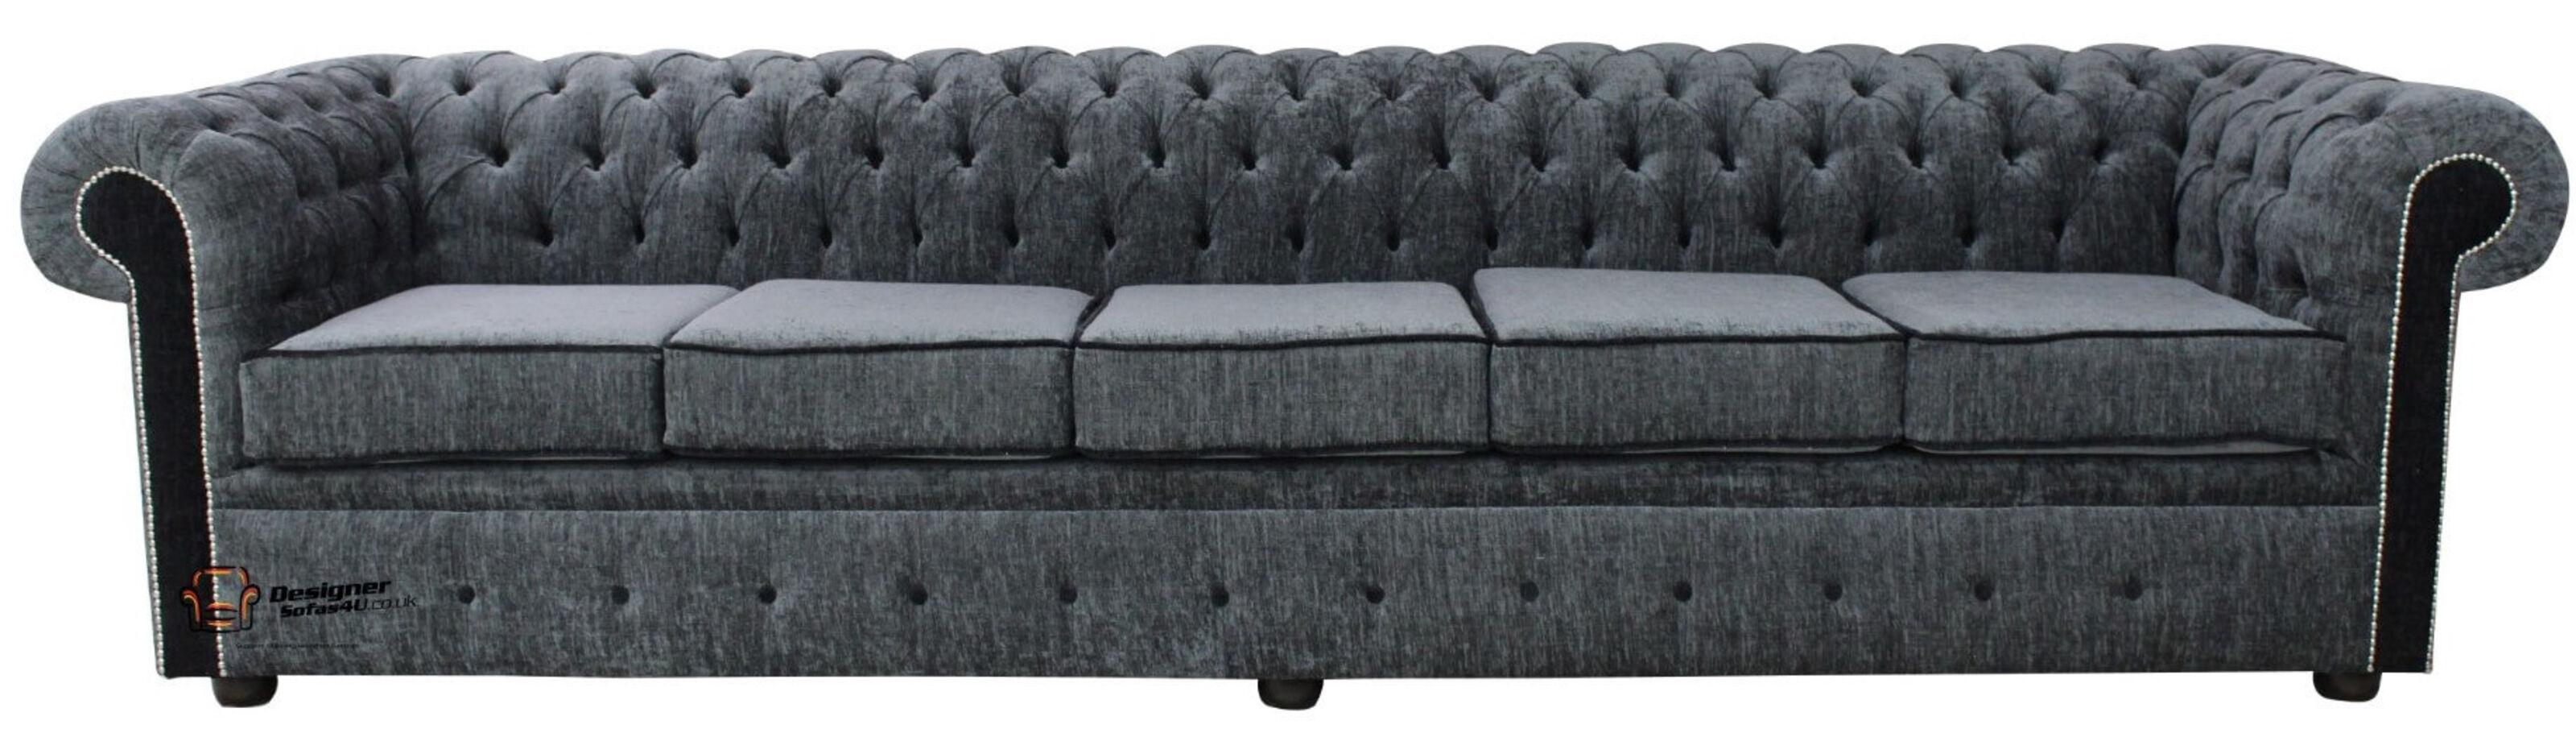 ... Chesterfield 5 Seater Sofa Settee Carlton Charcoal + Black Fabric